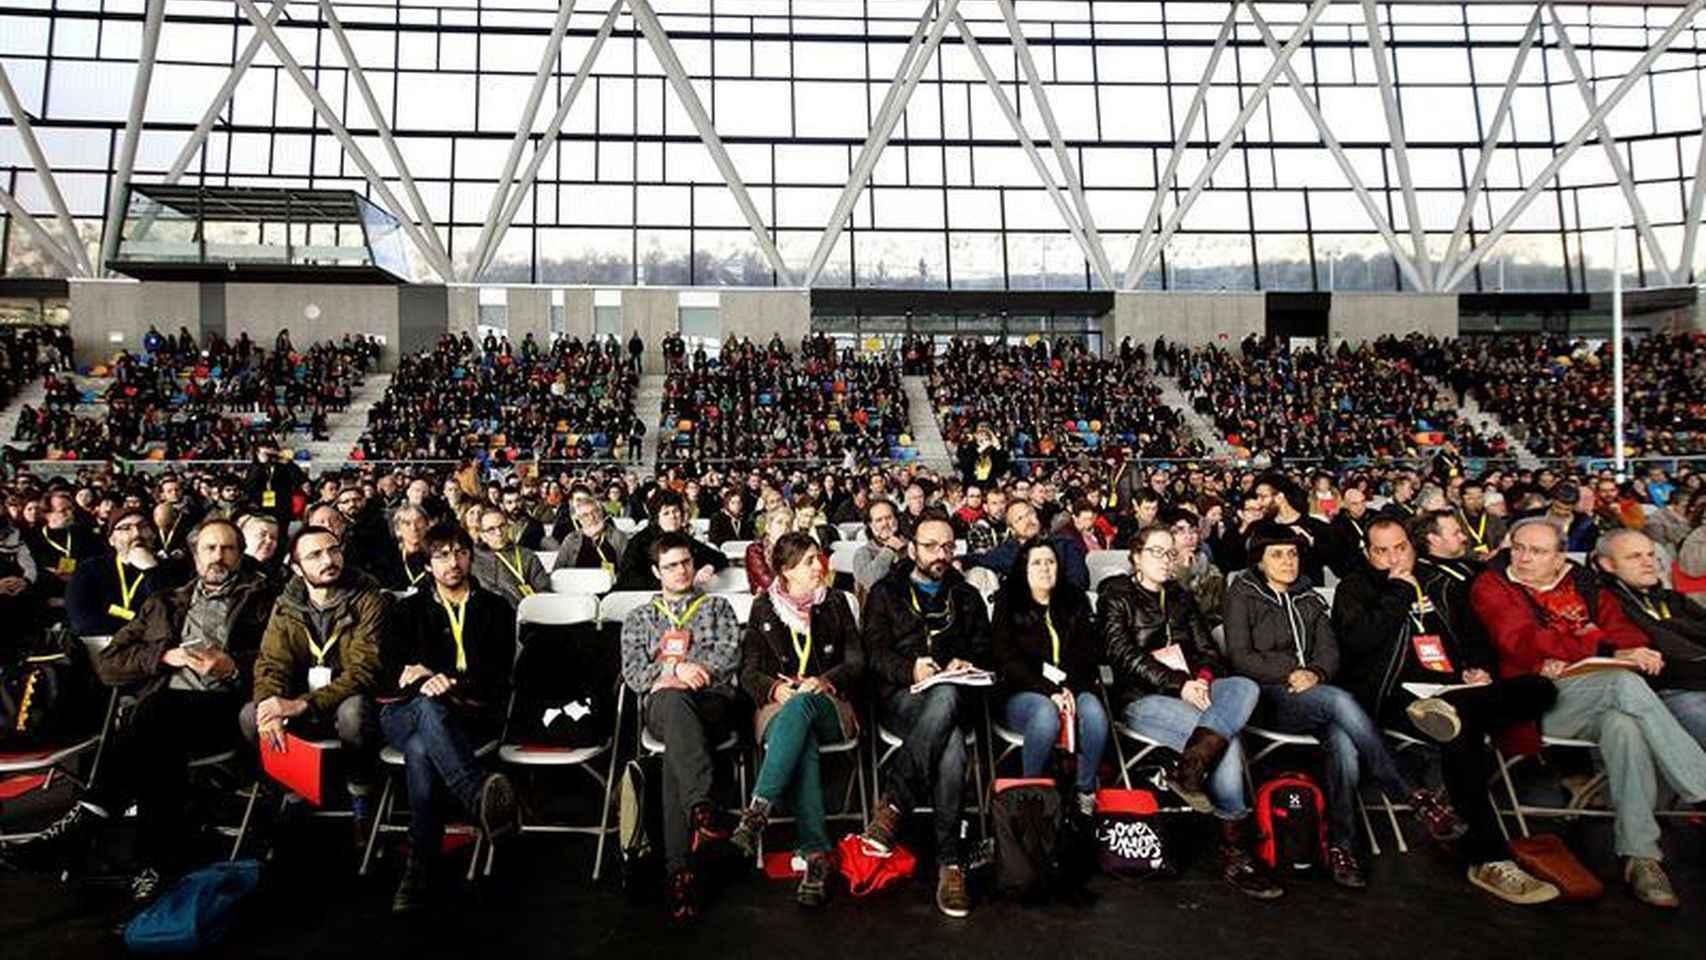 Vista general de los asistentes a la asamblea de la CUP del domingo.